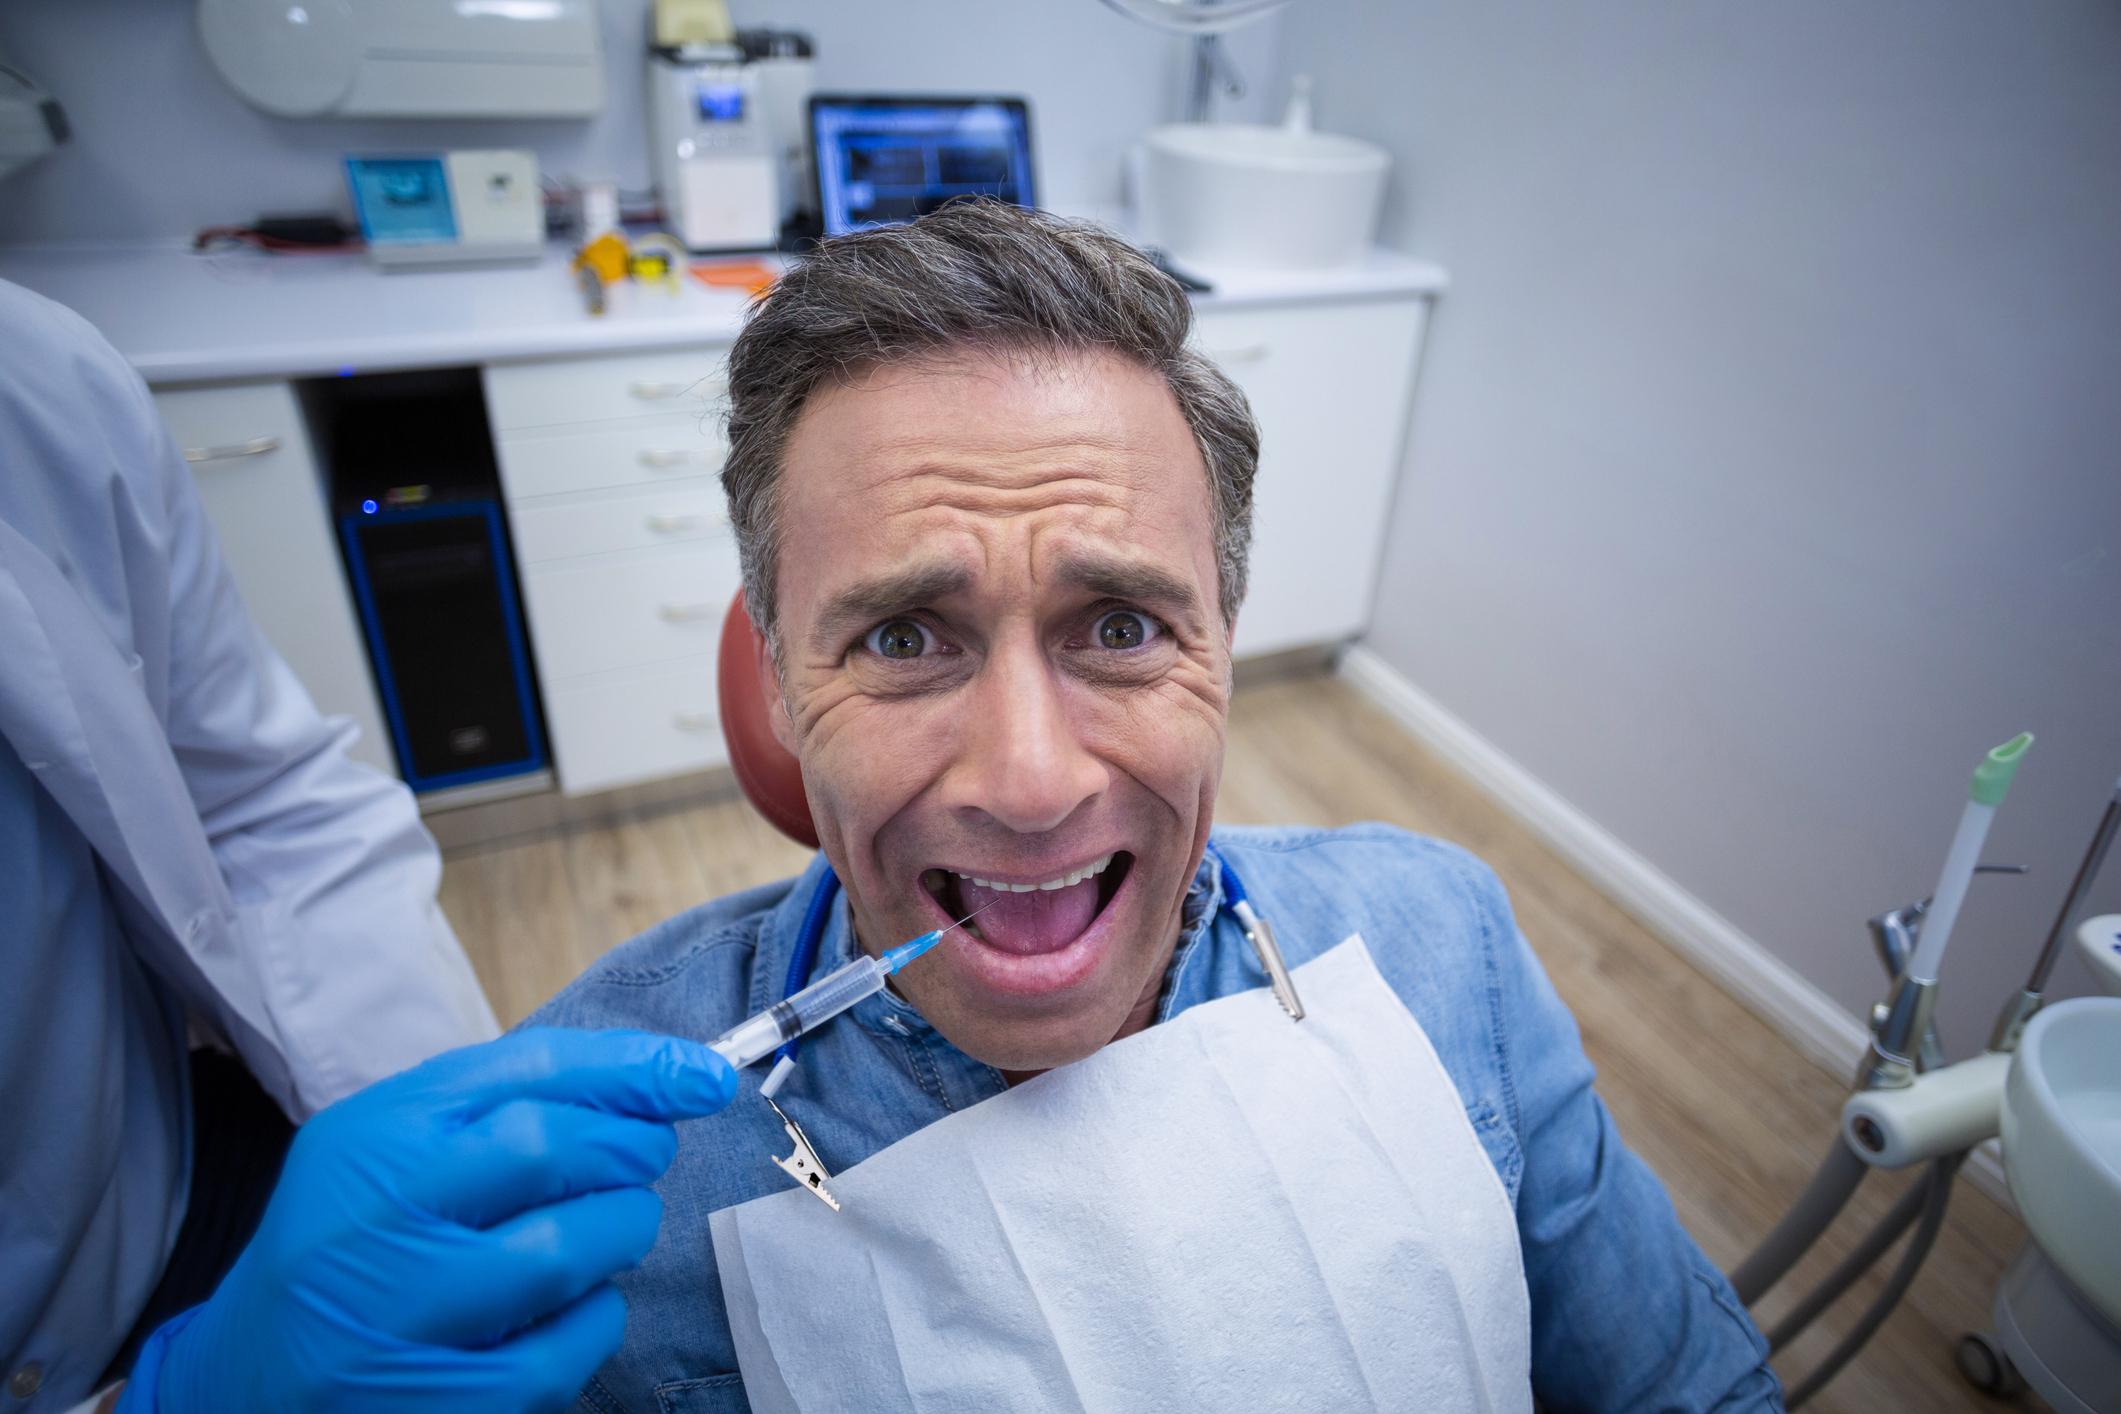 Terrified dental patient